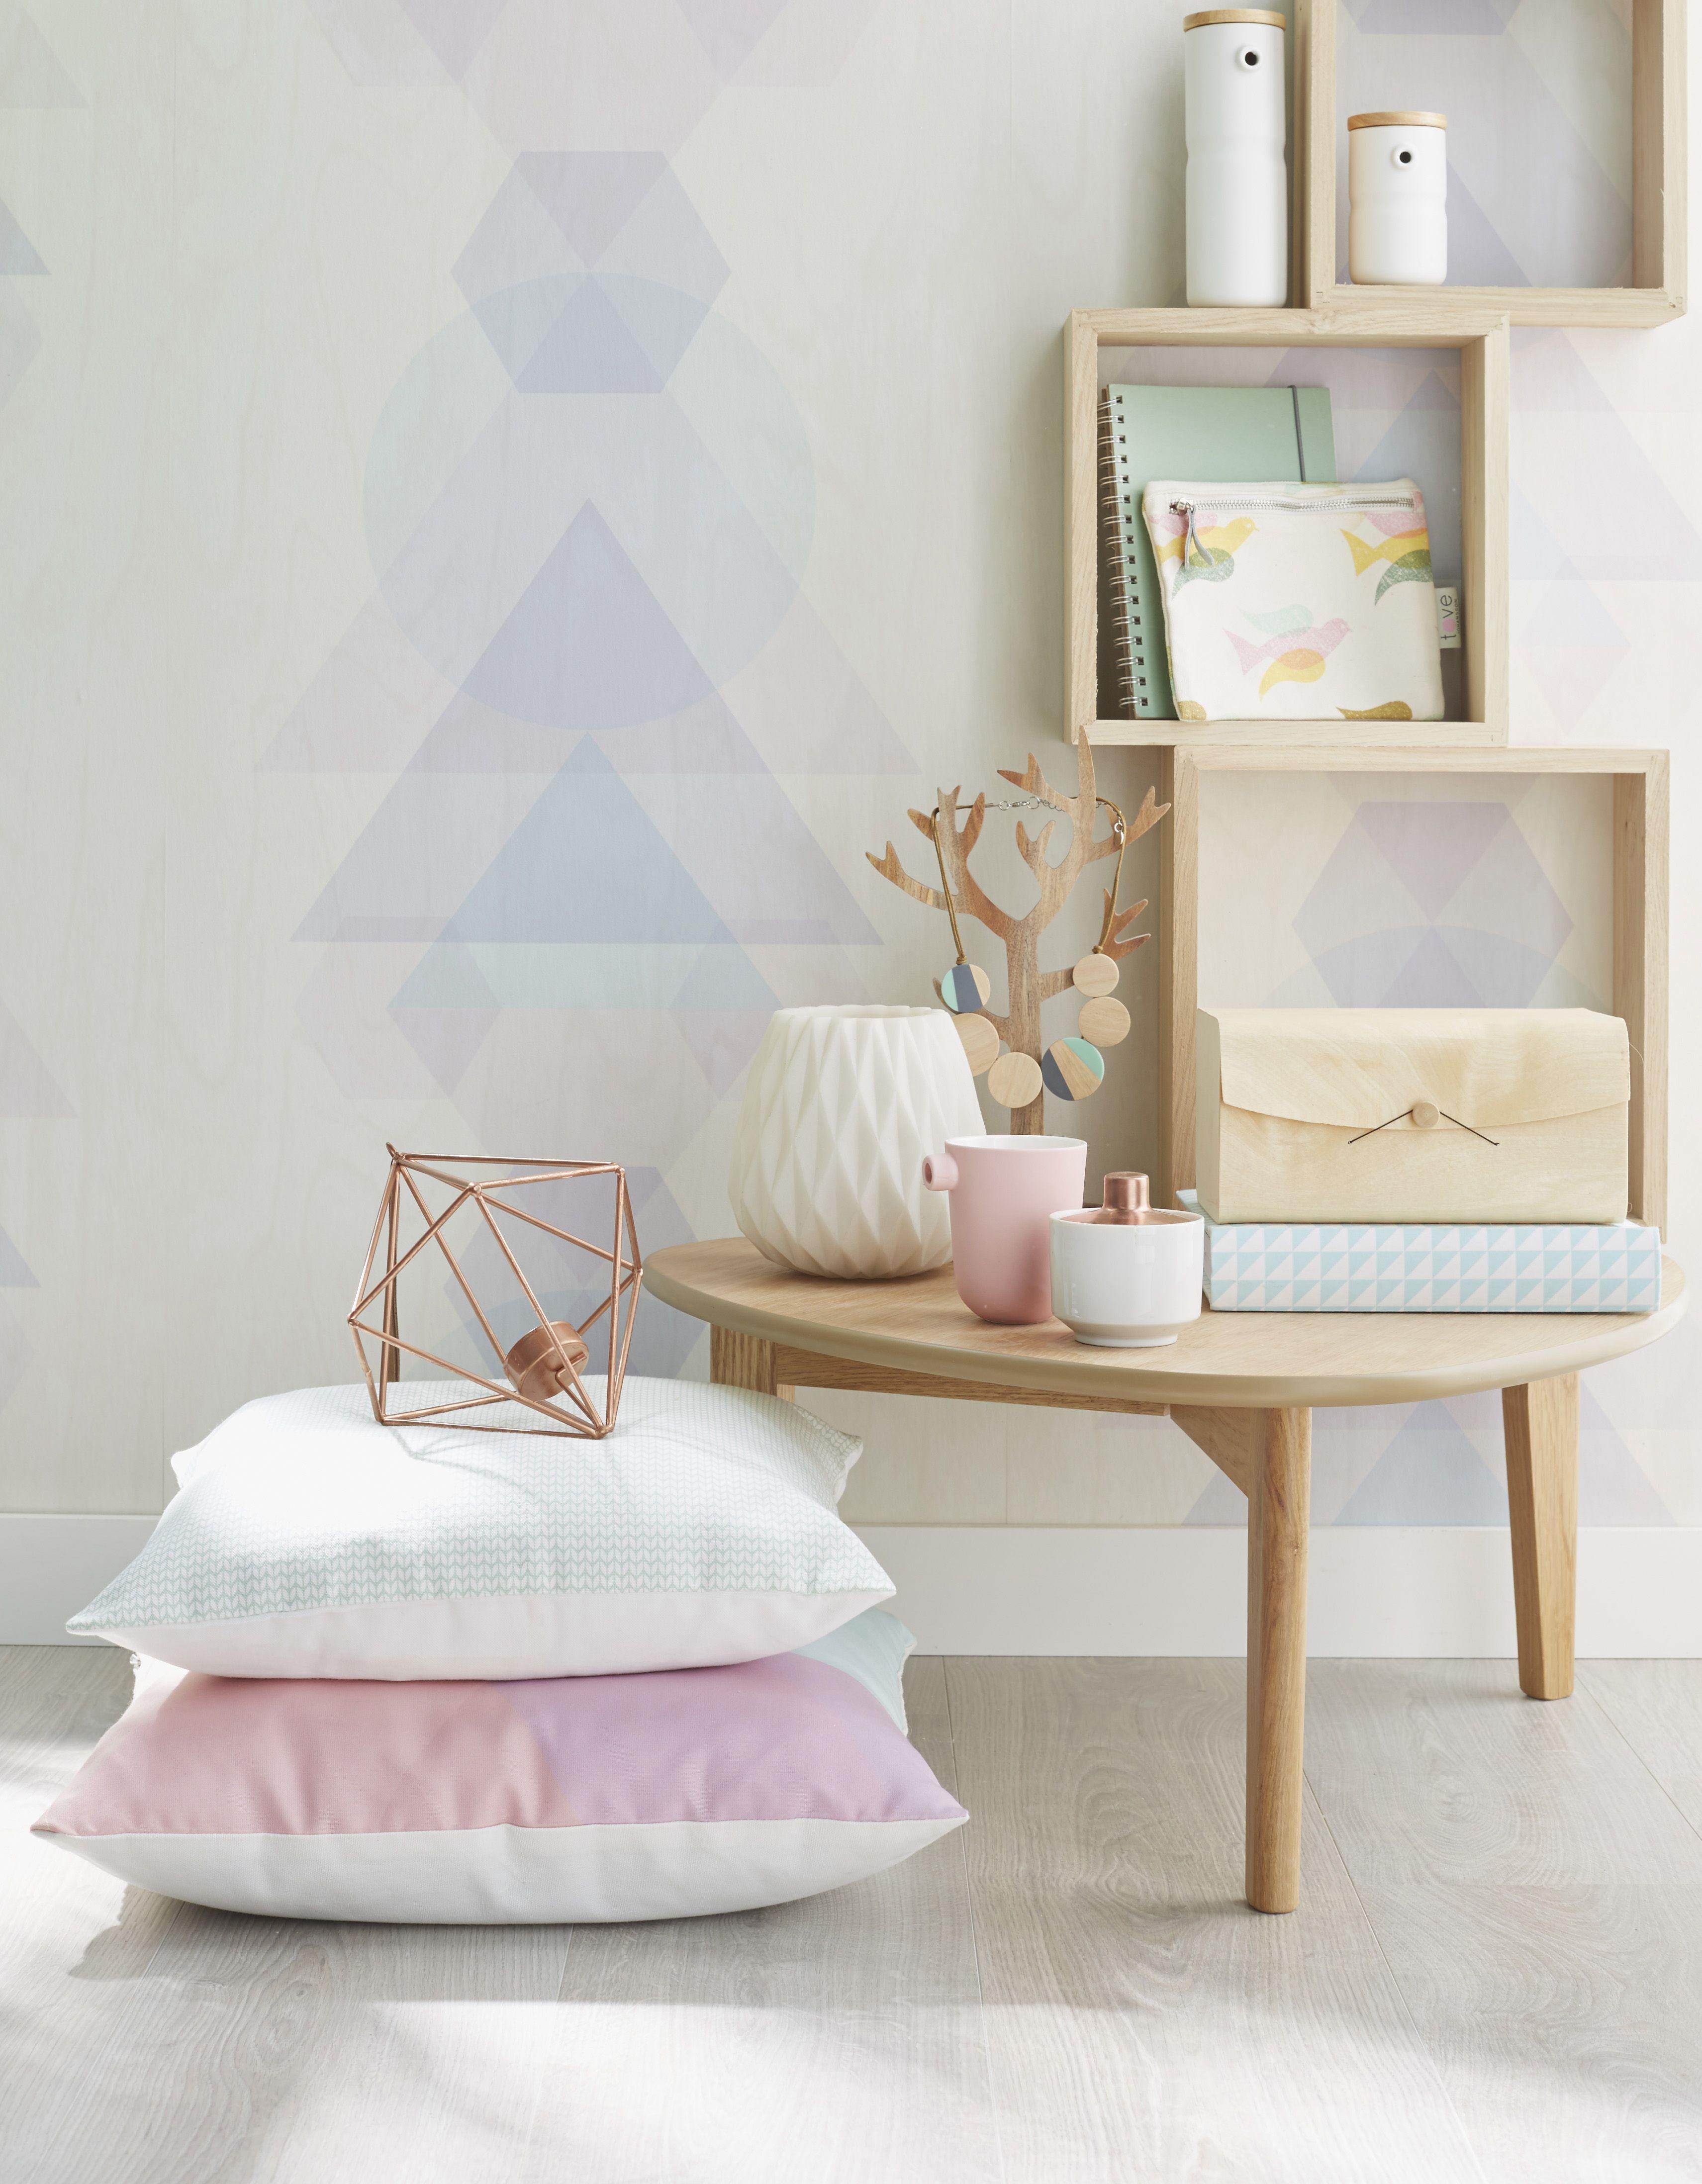 papier peint intiss oslo beige leroymerlin wallpaper papierpeint tendance scandinave